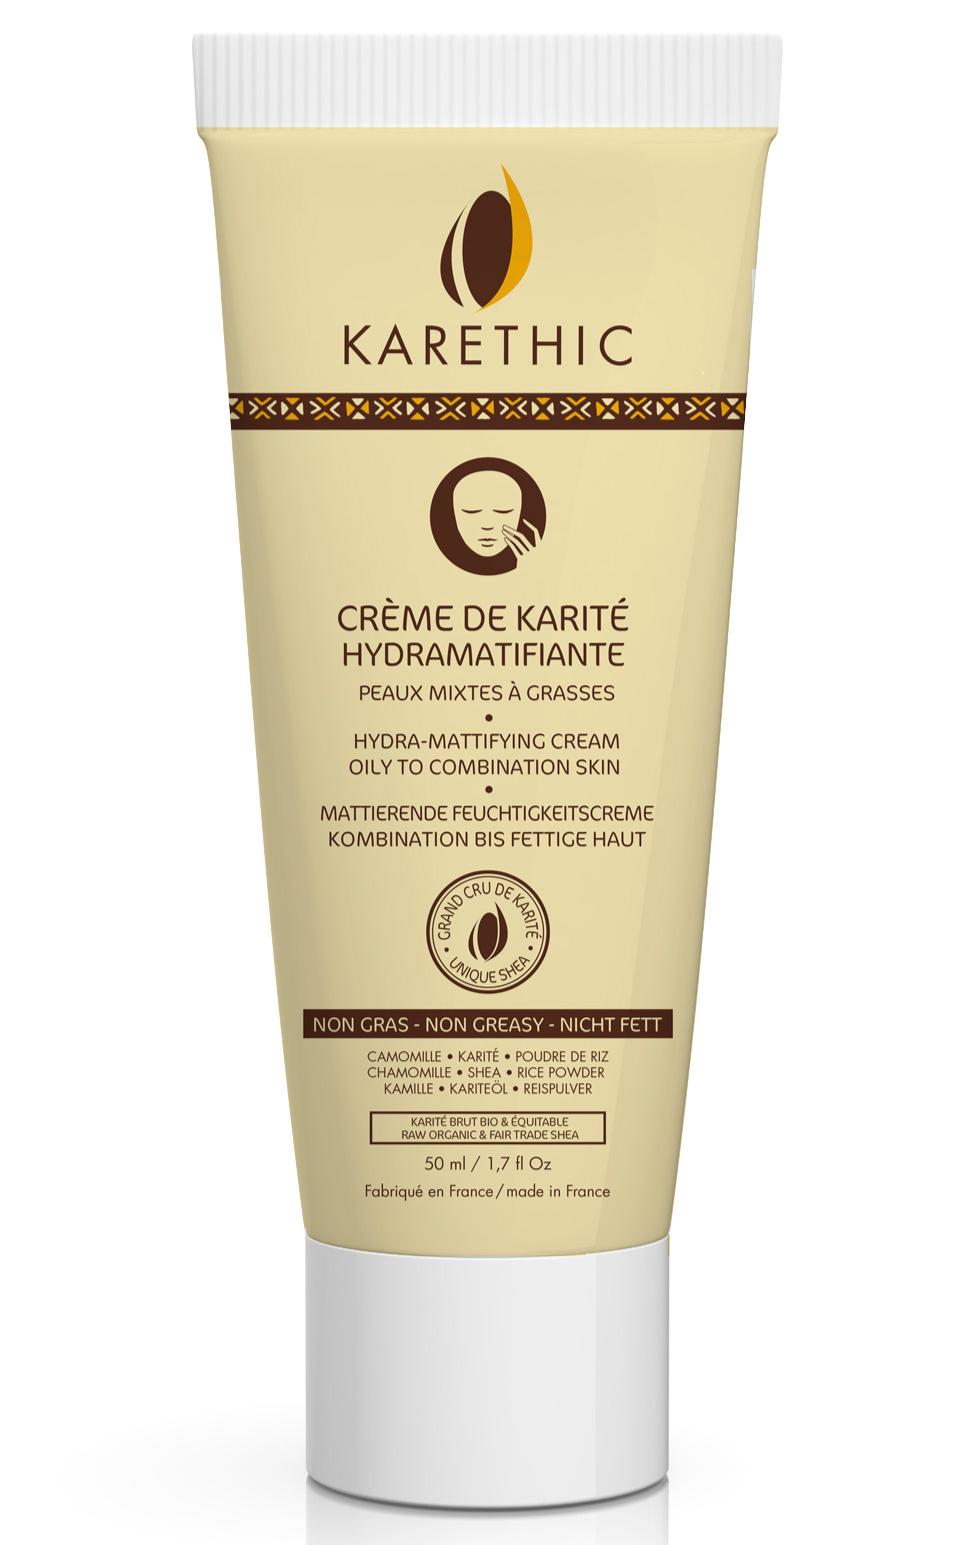 Karethic_Crème de karite_ Hydramatifiante